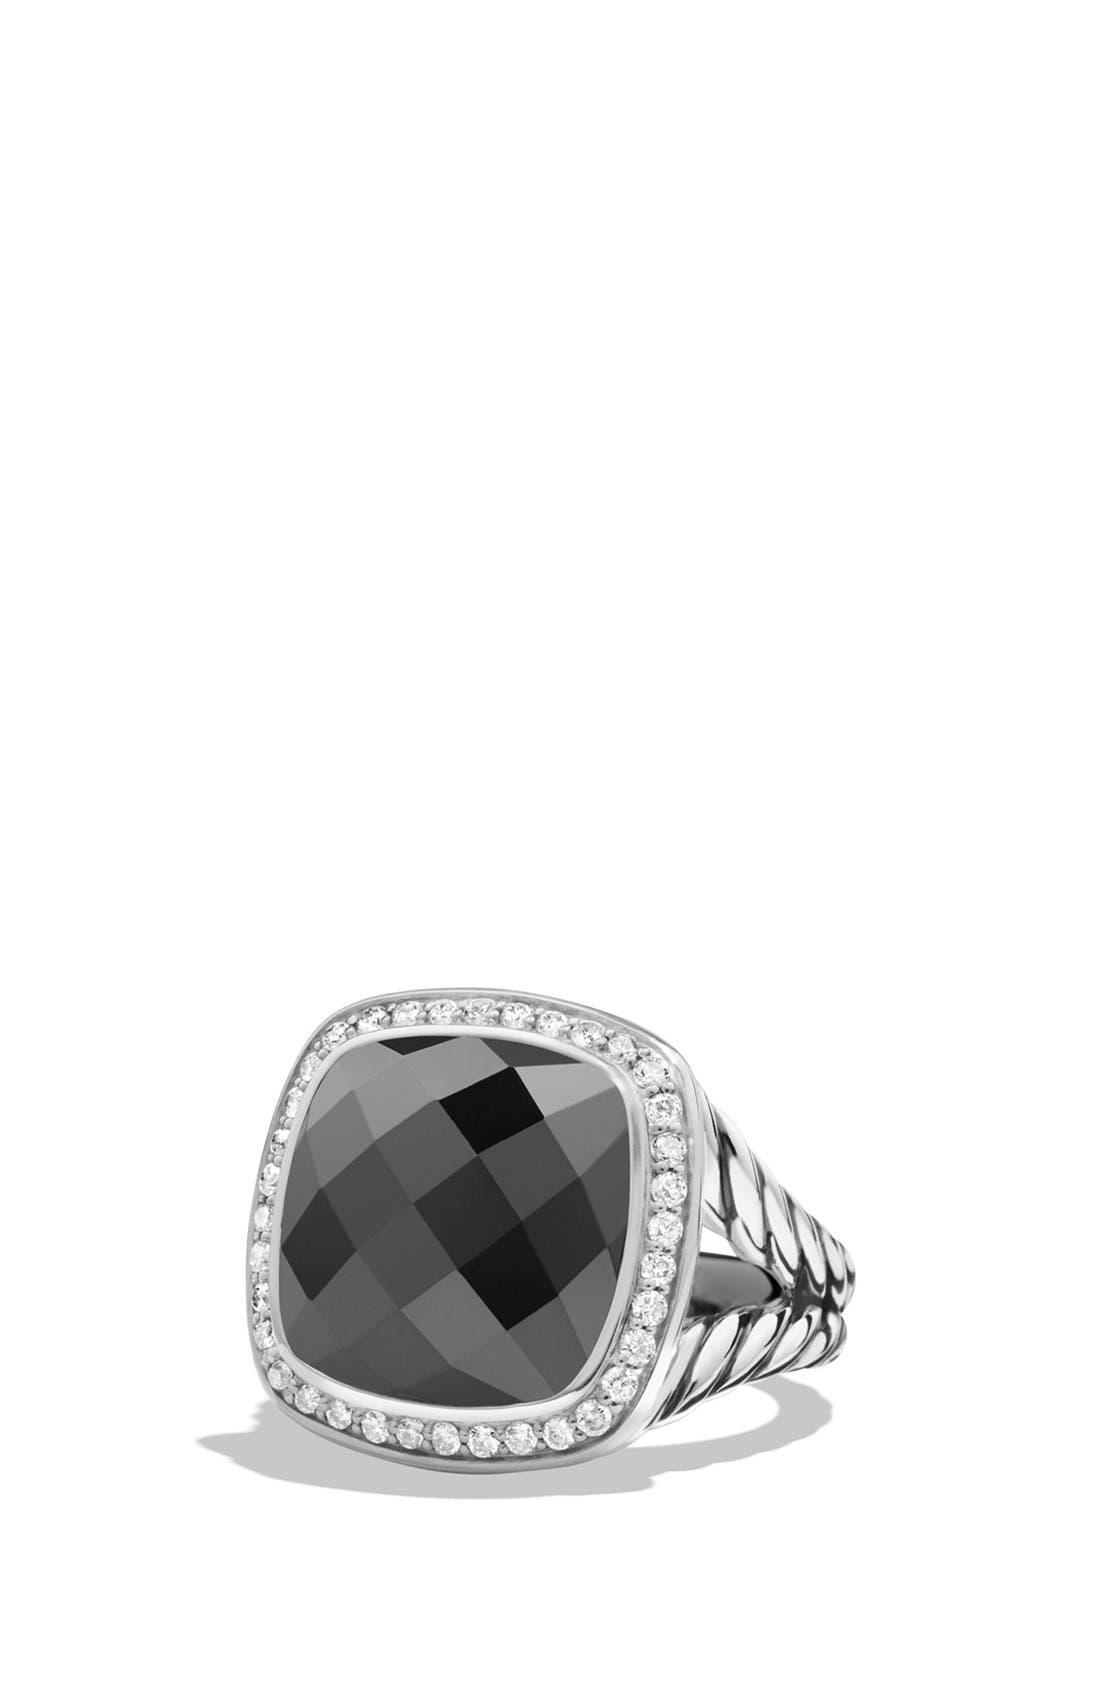 David Yurman 'Albion' Ring with Semiprecious Stone and Diamonds